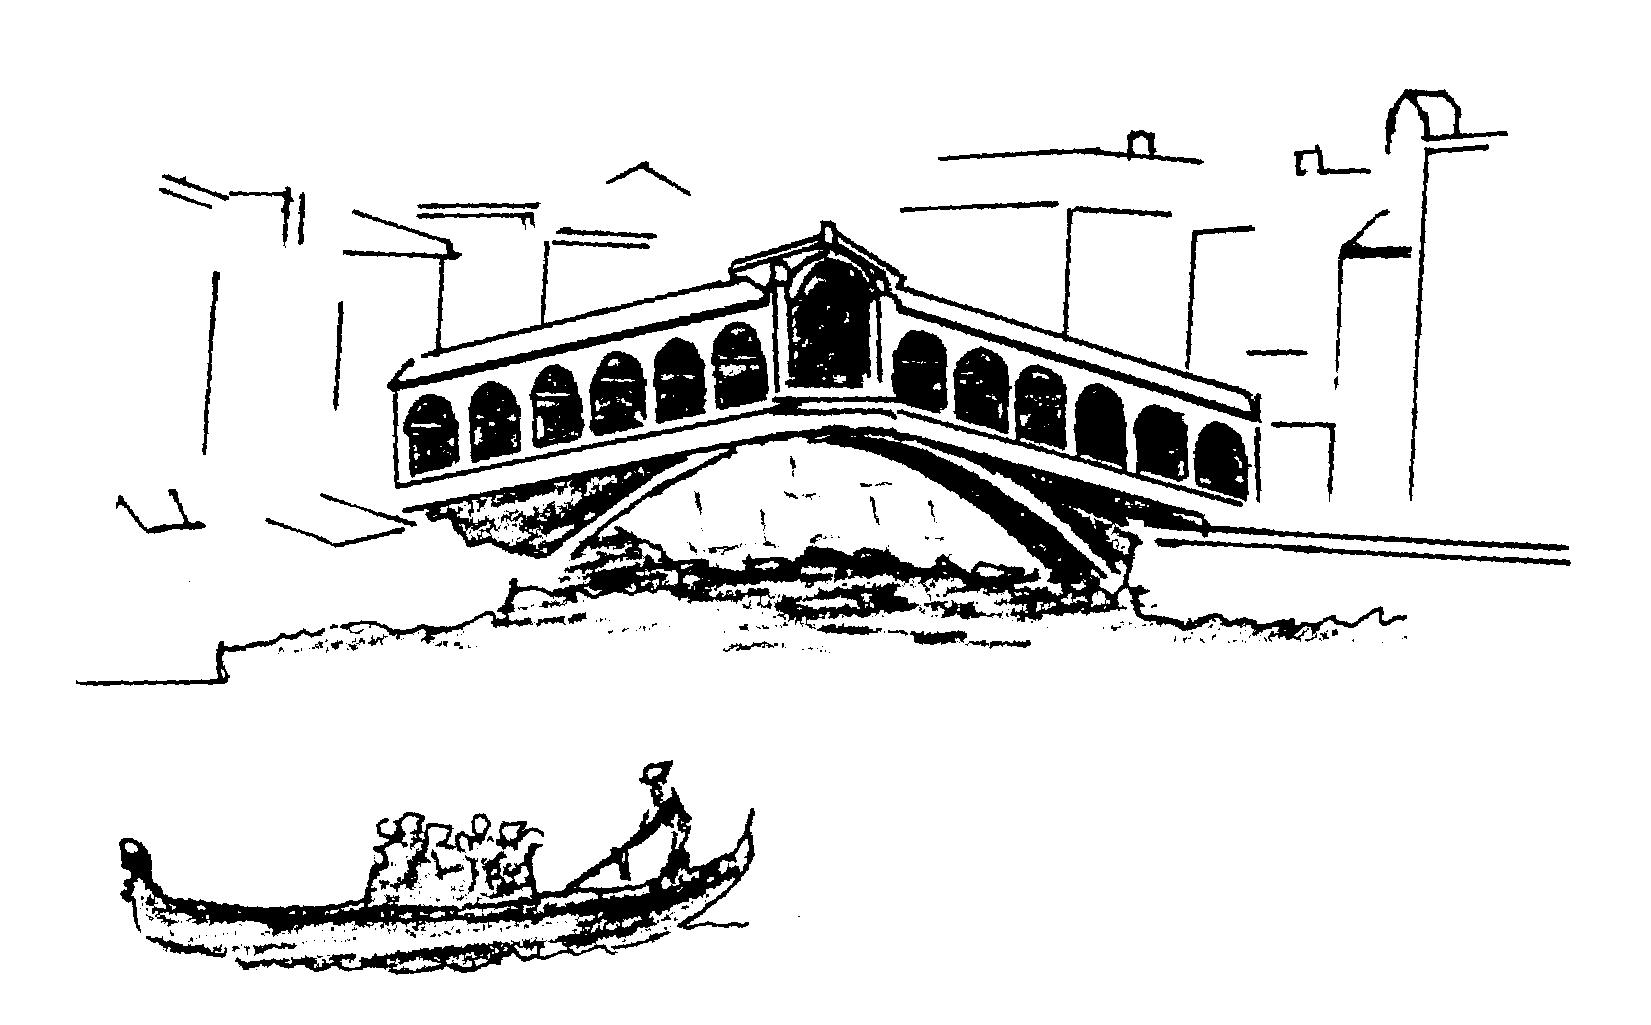 Sketch of the Rialto